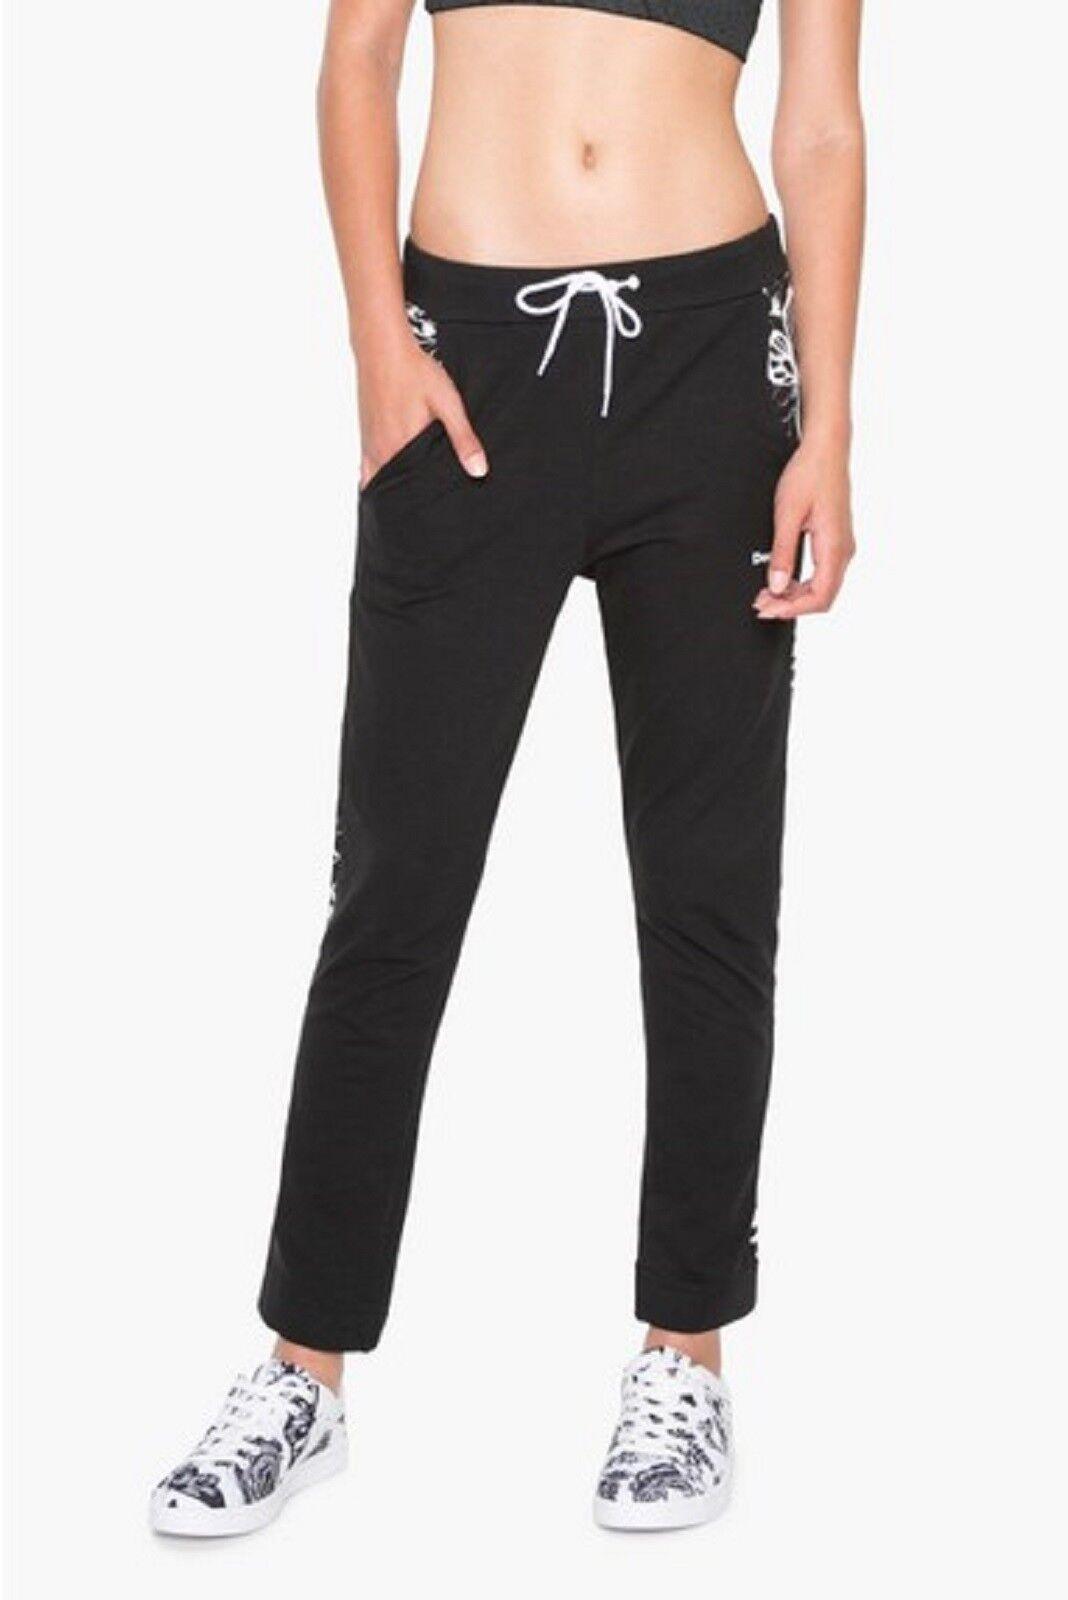 Desigual Sport -  ocio pantalones  sweatpant _ exorbidance  estrella negra de f s  venta de ofertas